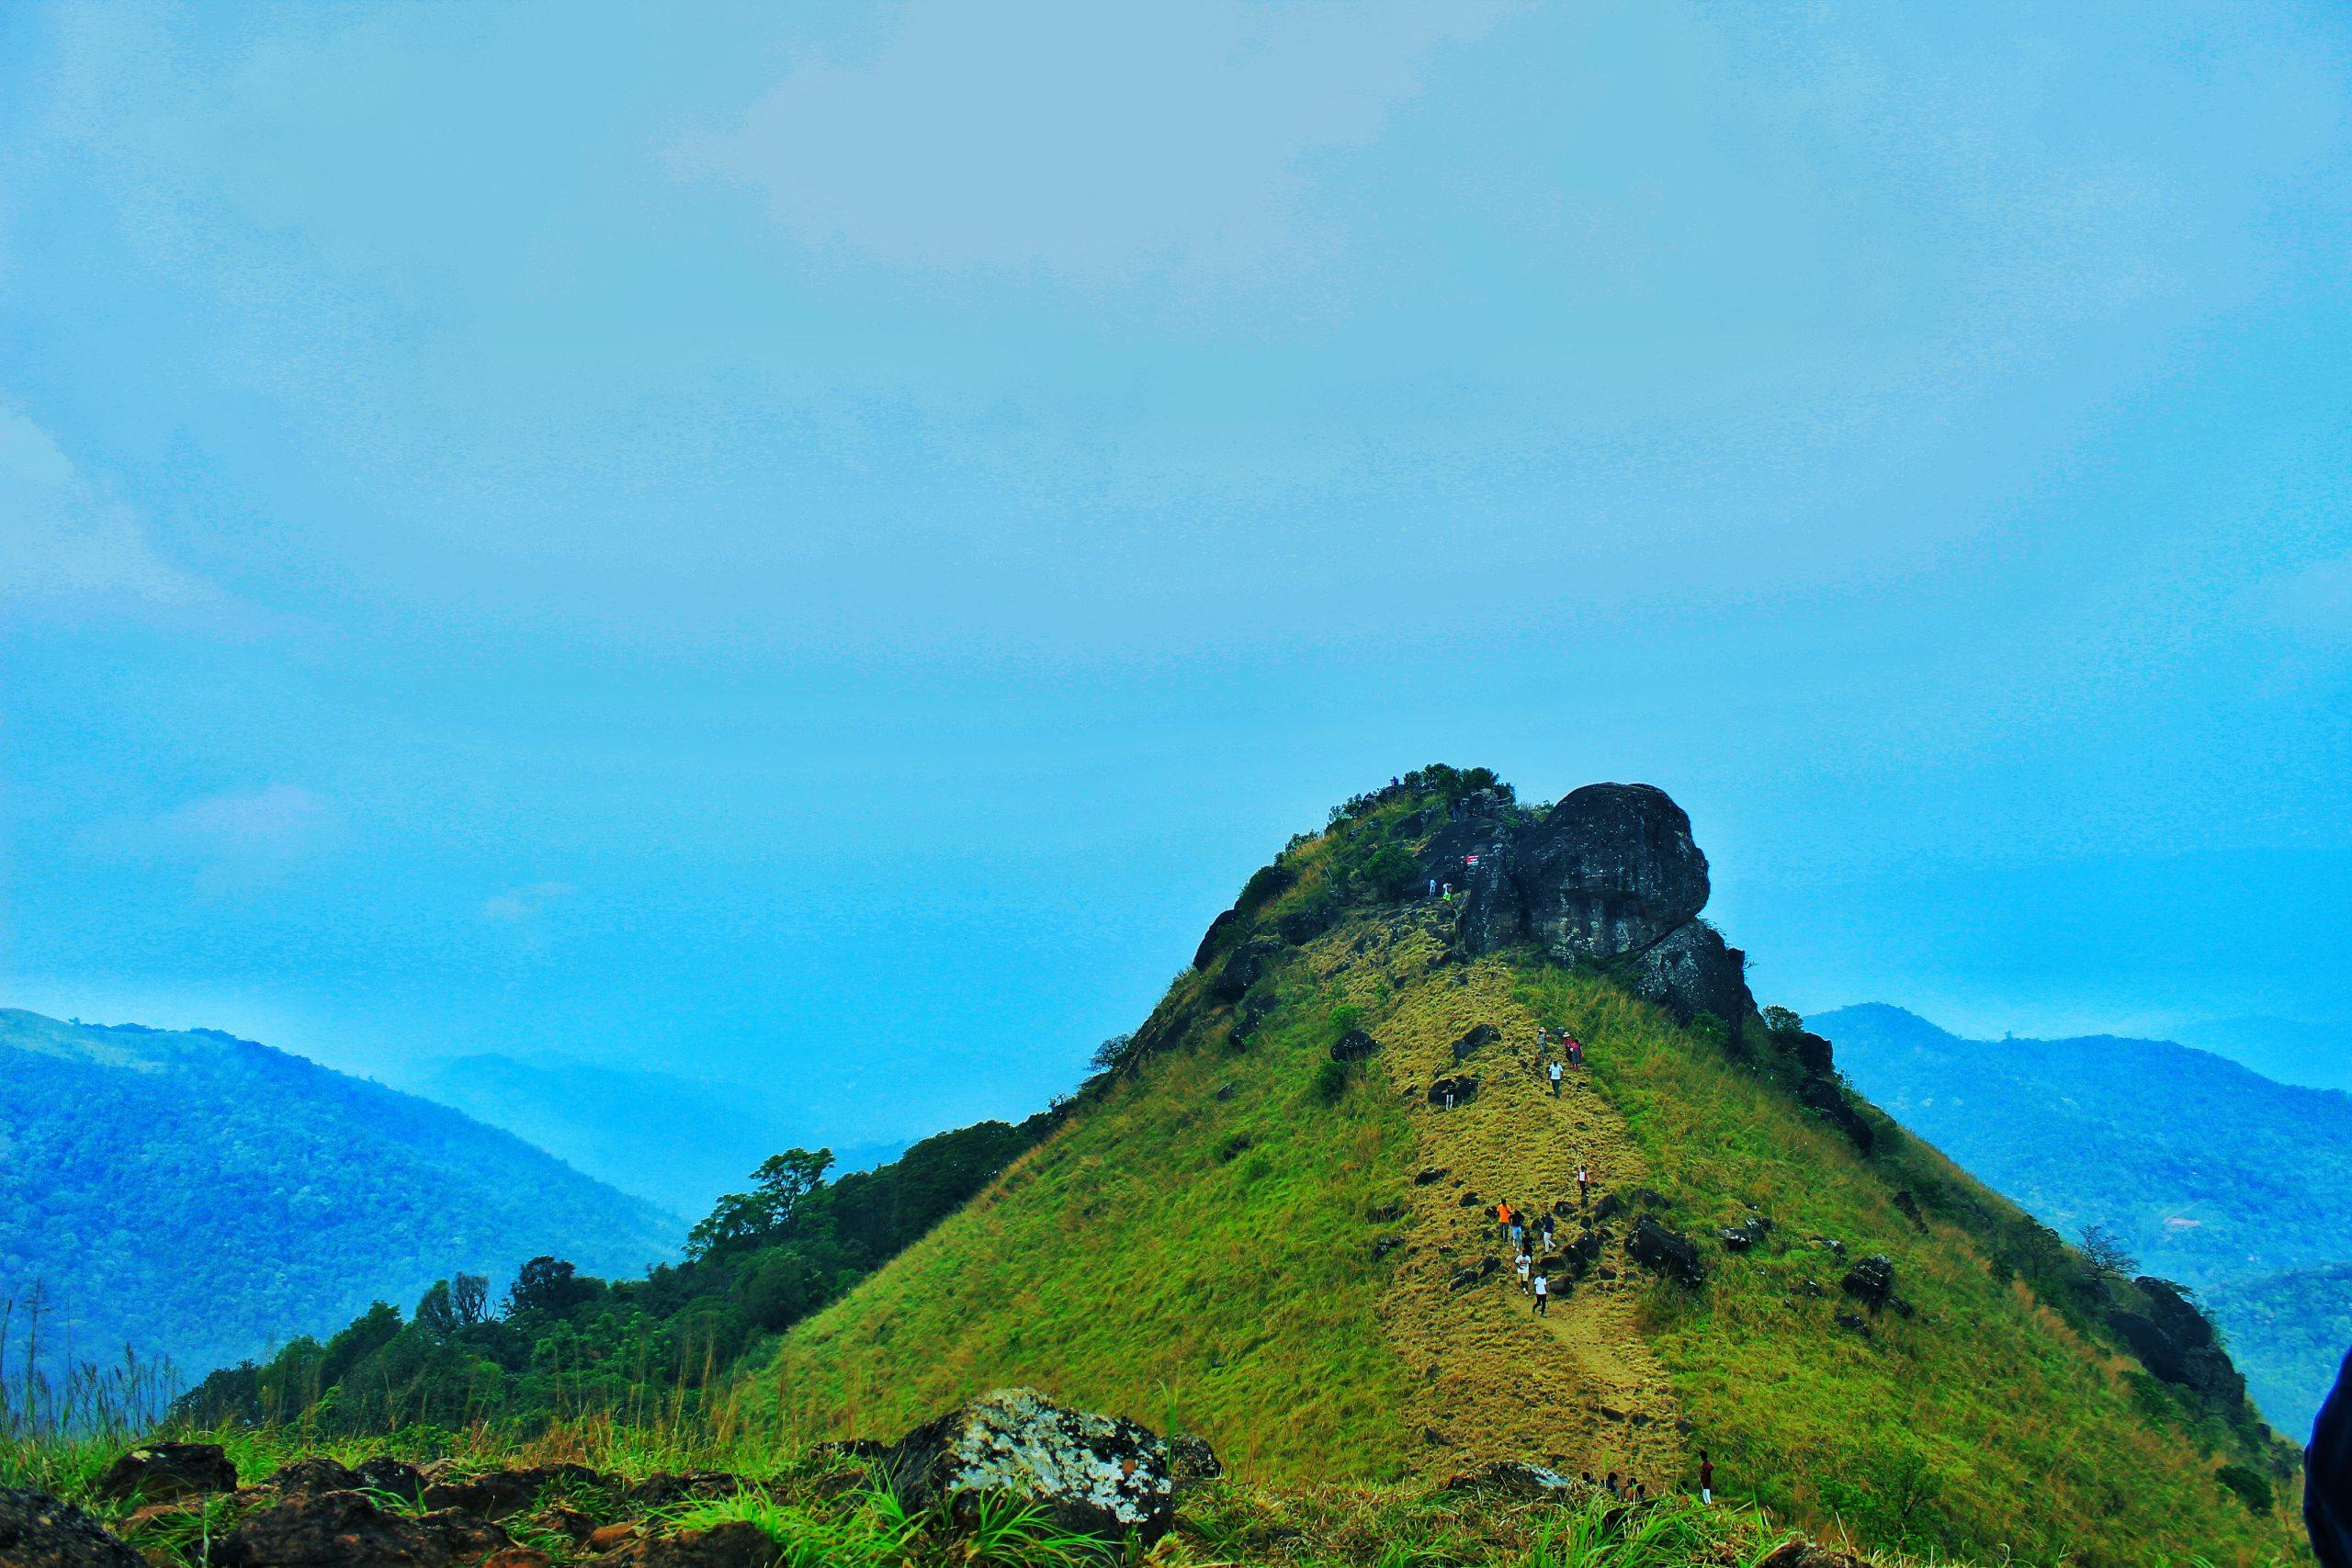 Green Hill Top